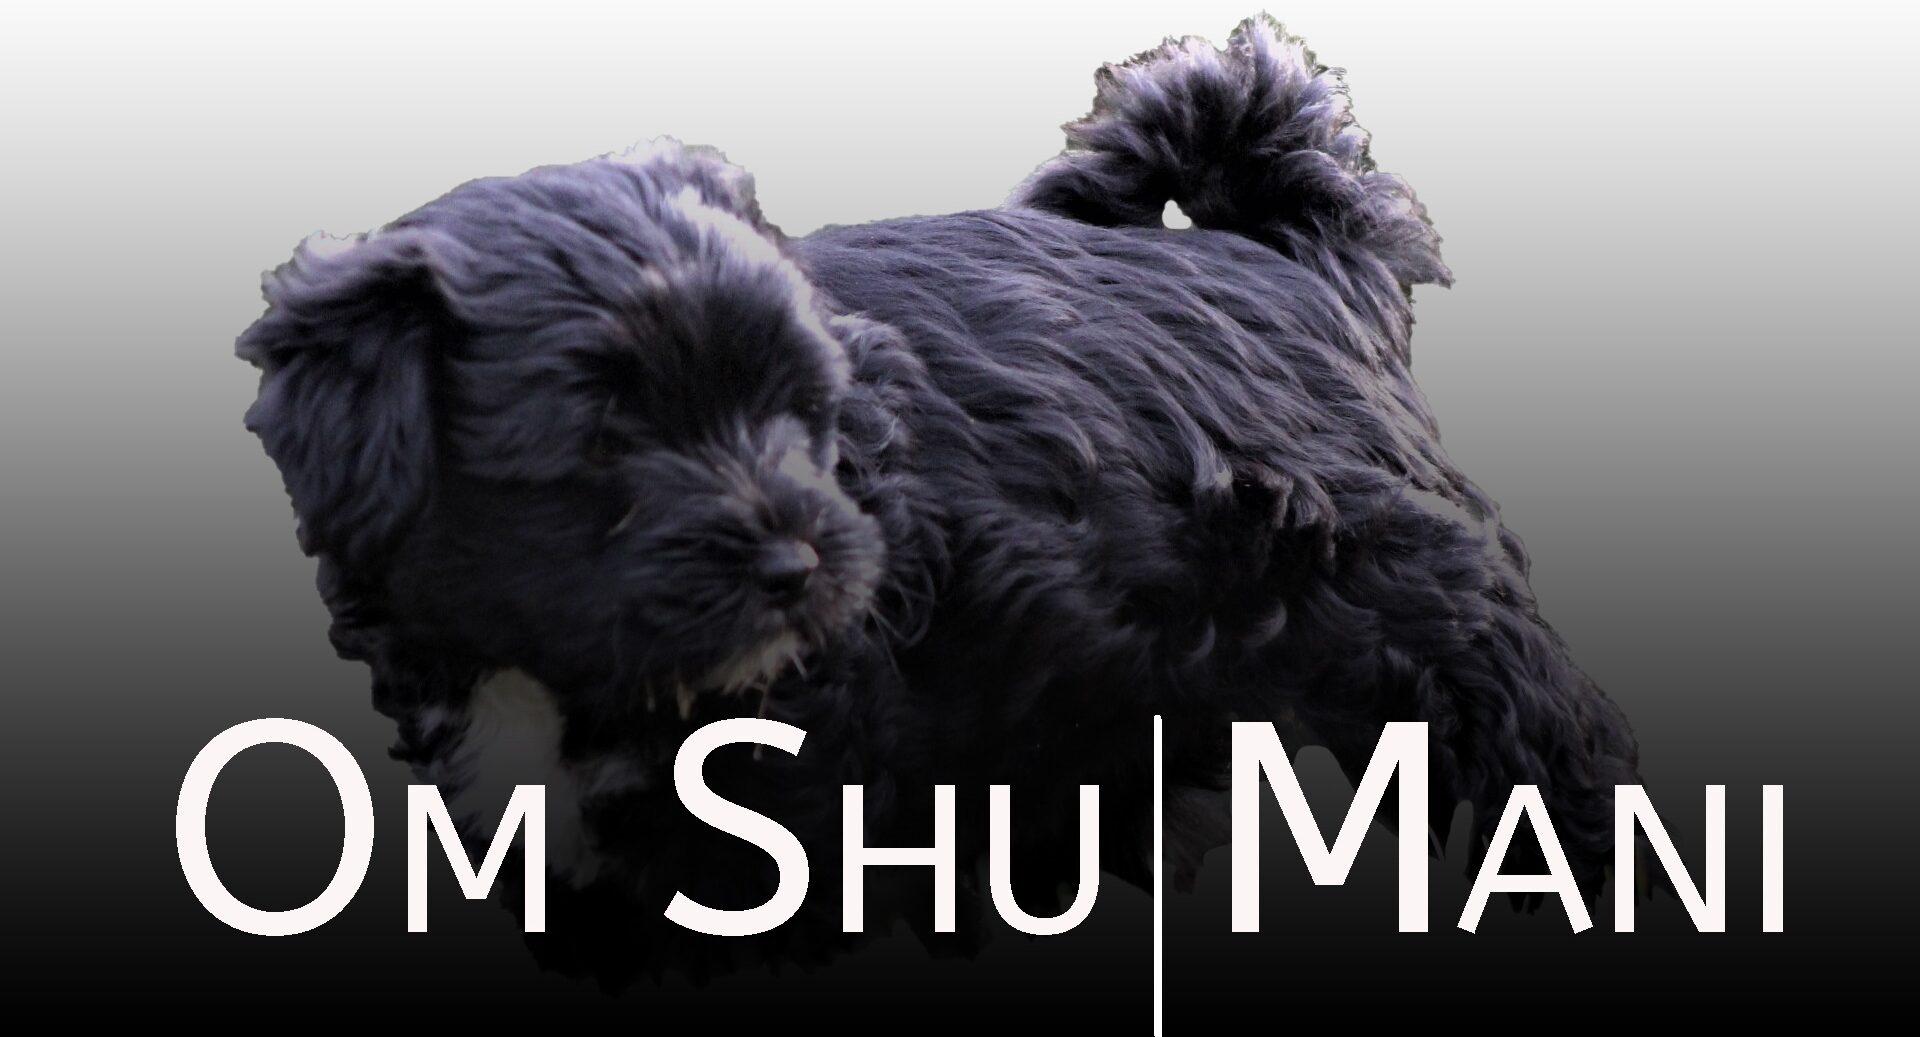 Om Shu Mani